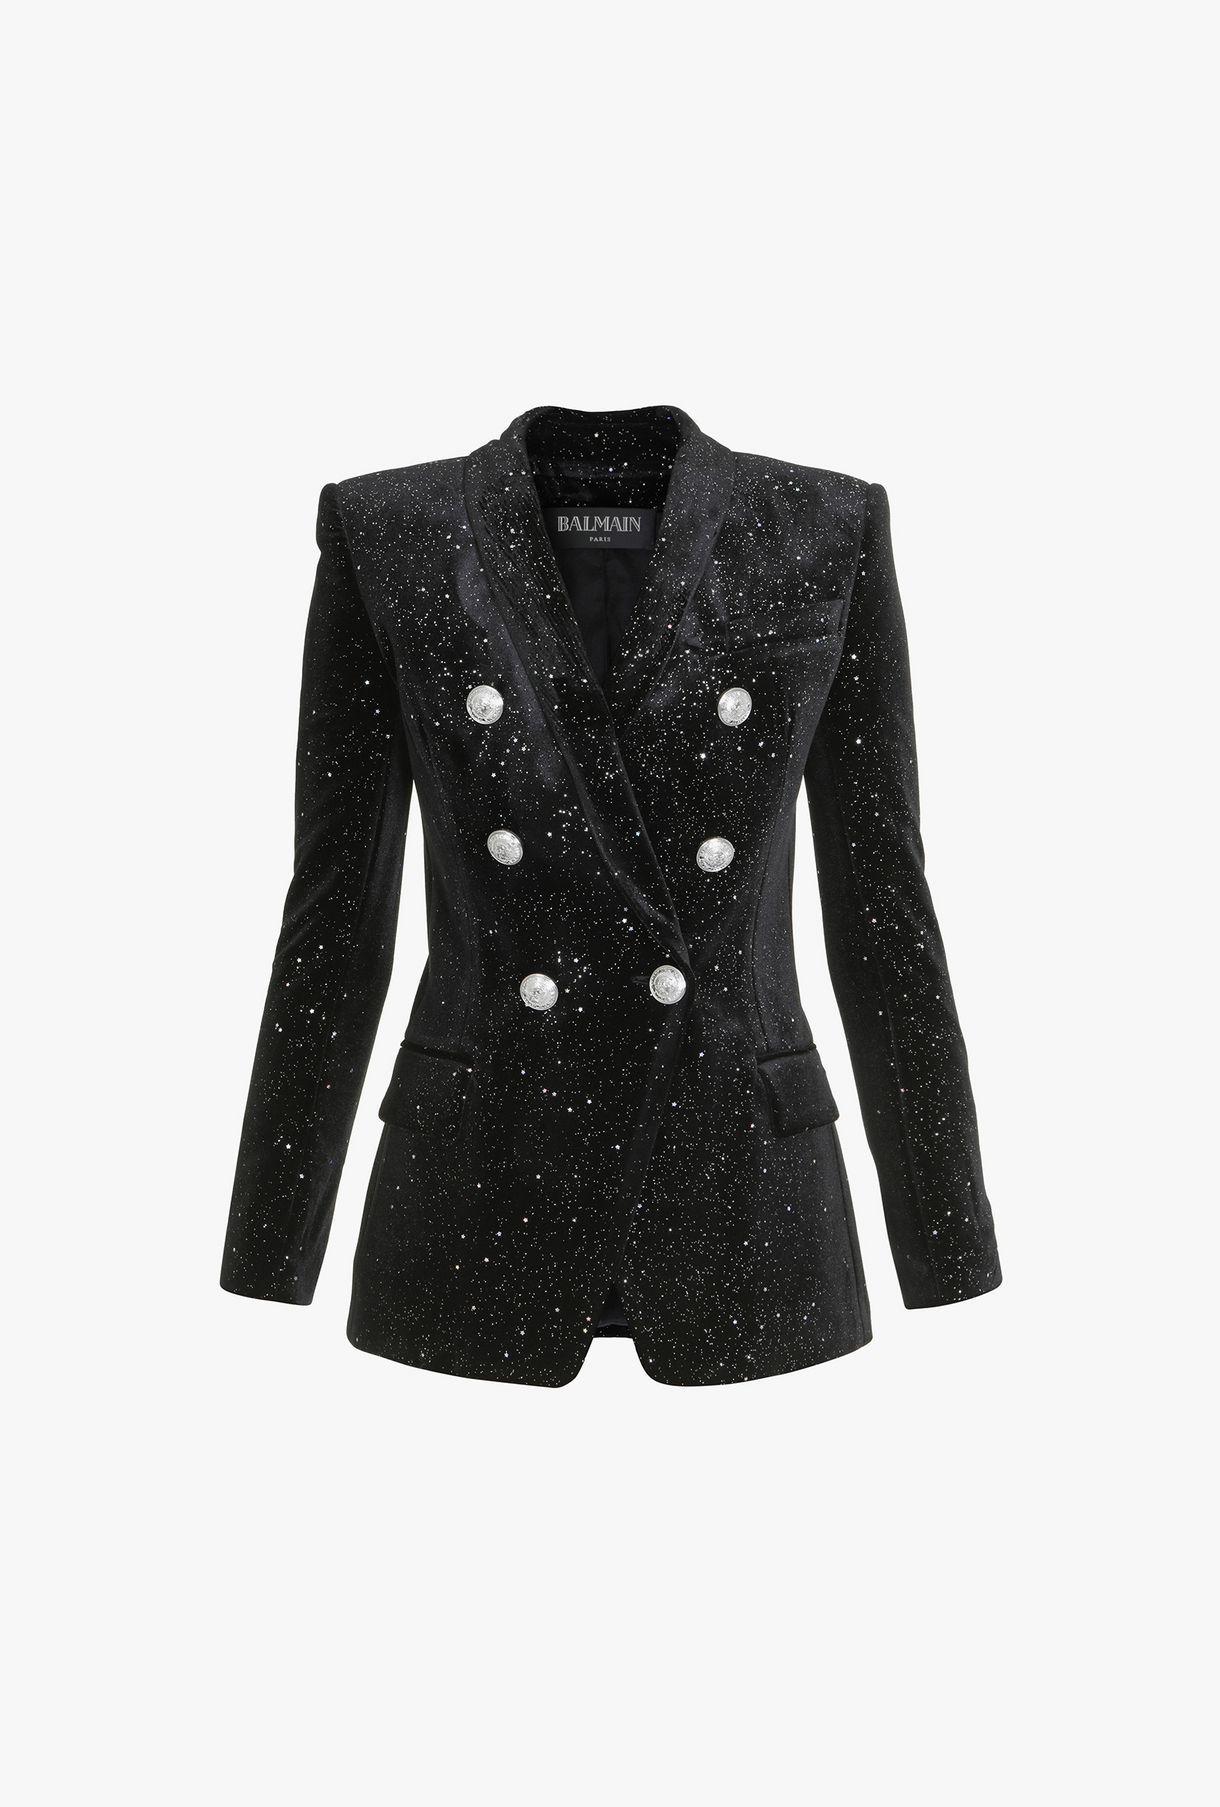 f735ba8c876 BALMAIN Oversized double-breasted velvet blazer Jacket Woman f ...